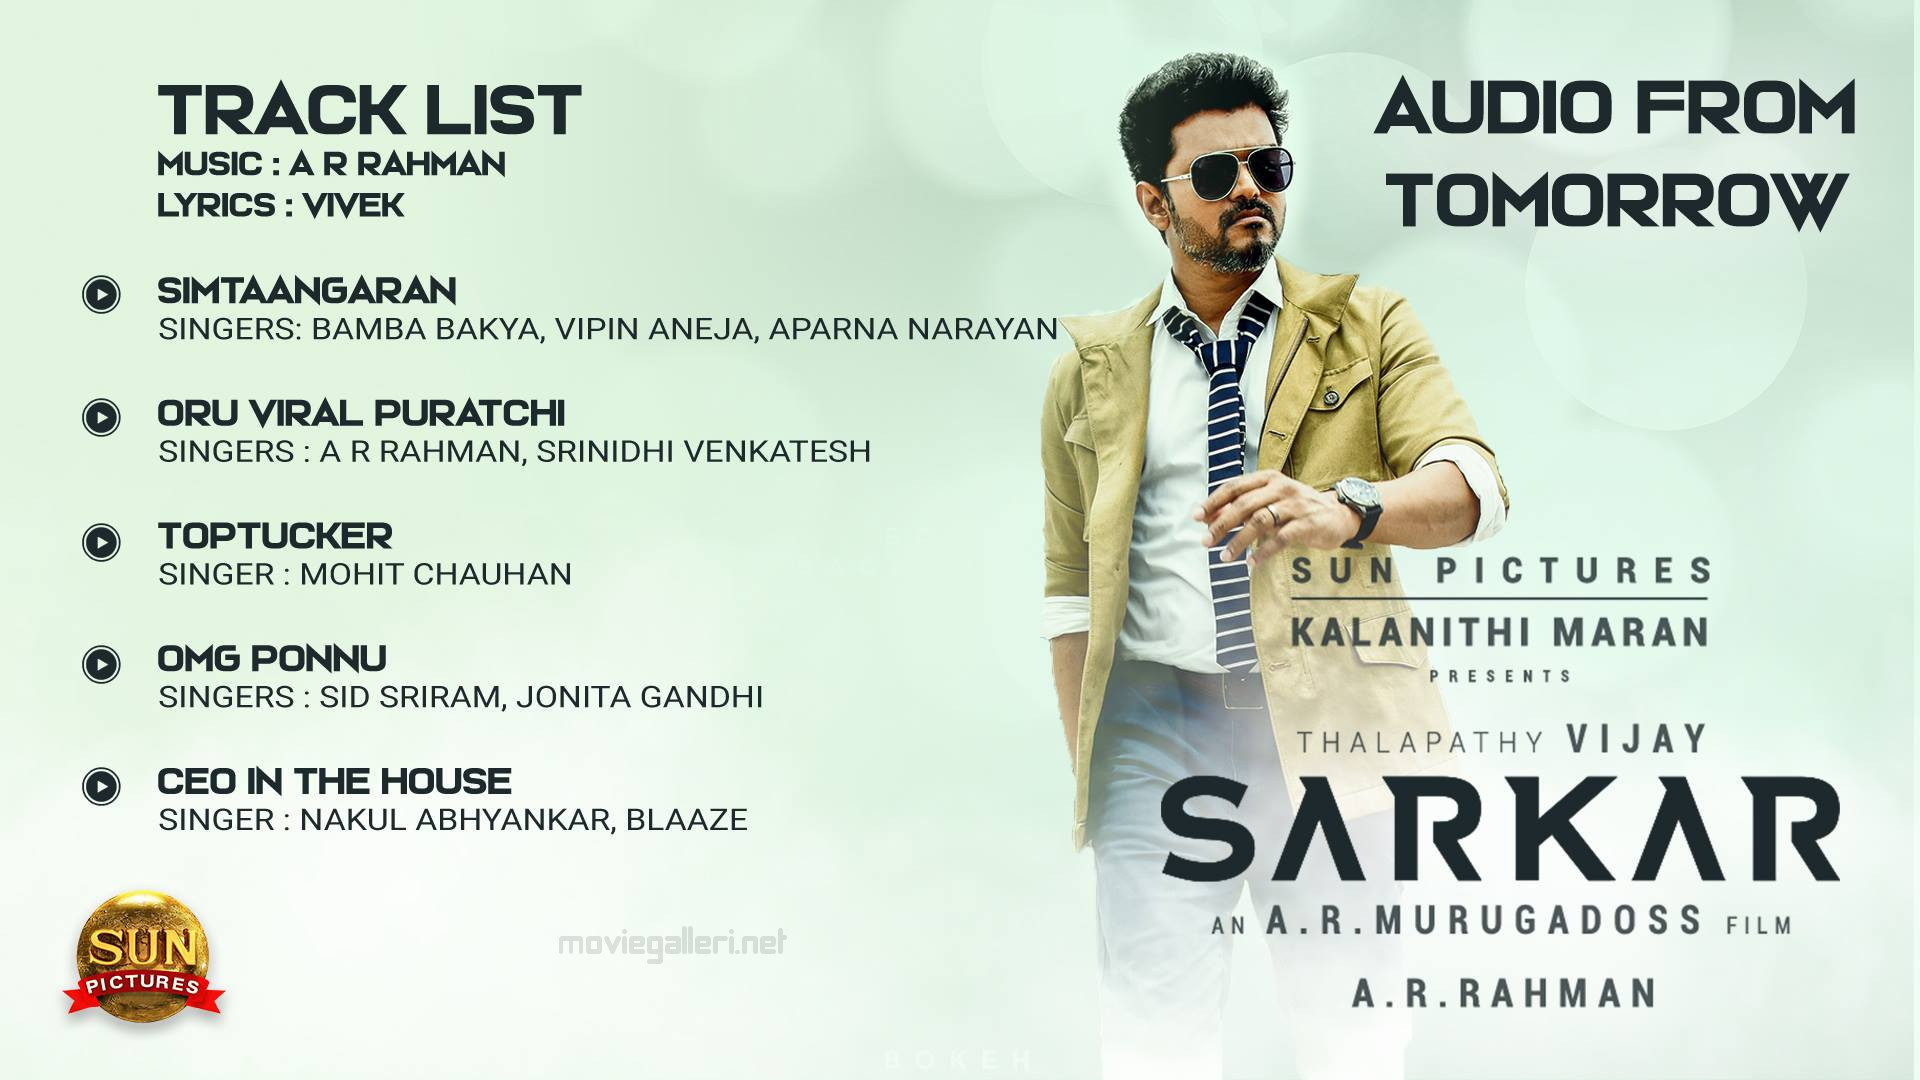 Vijay Sarkar Audio Song Tracklist Photo HD